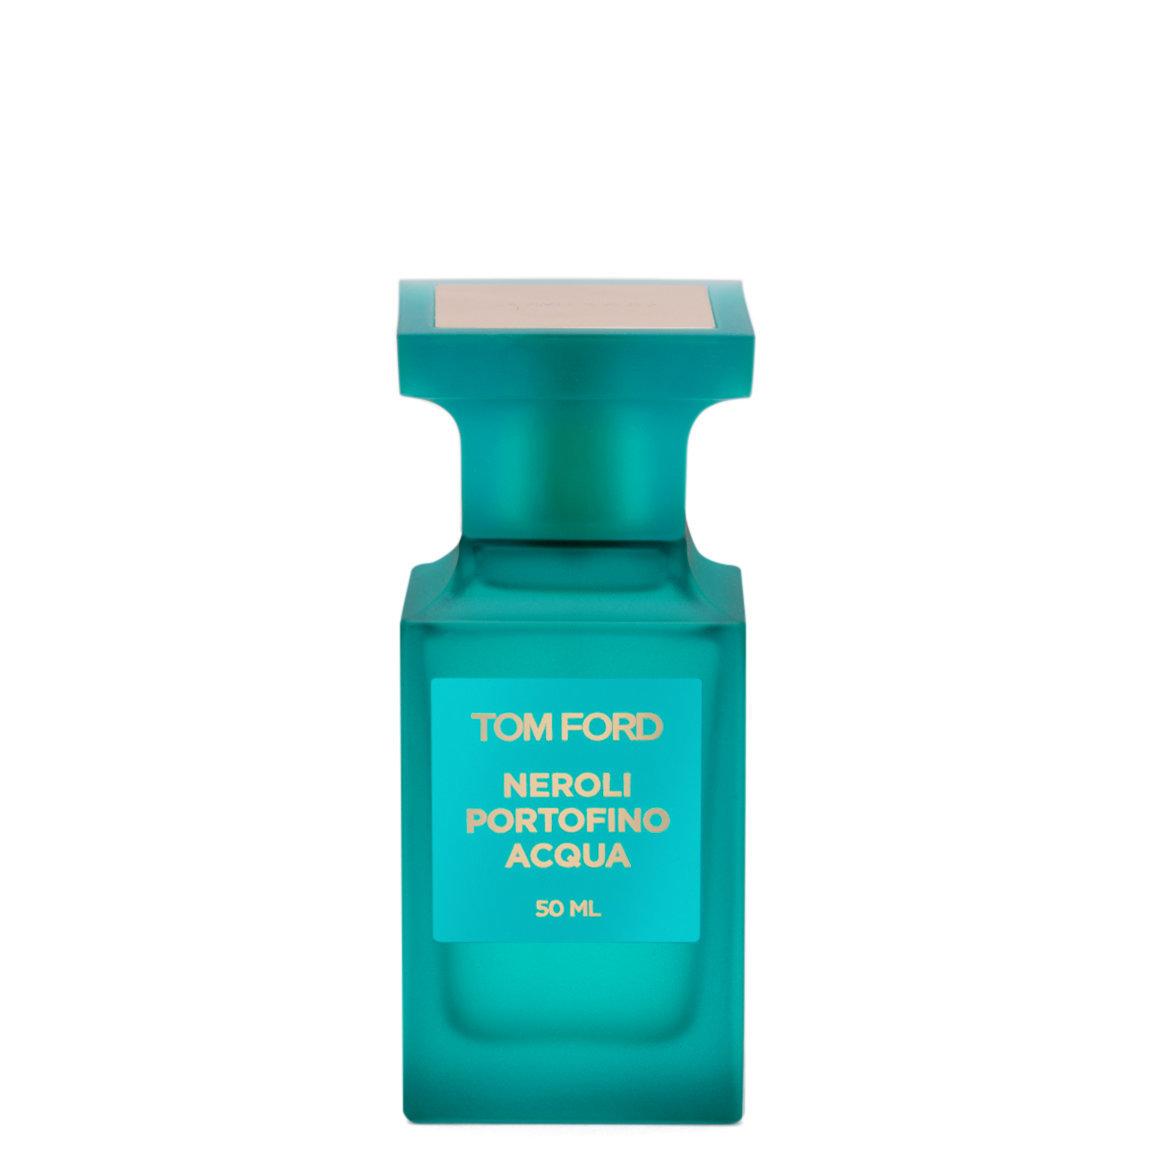 TOM FORD Neroli Portofino Acqua 50 ml product swatch.